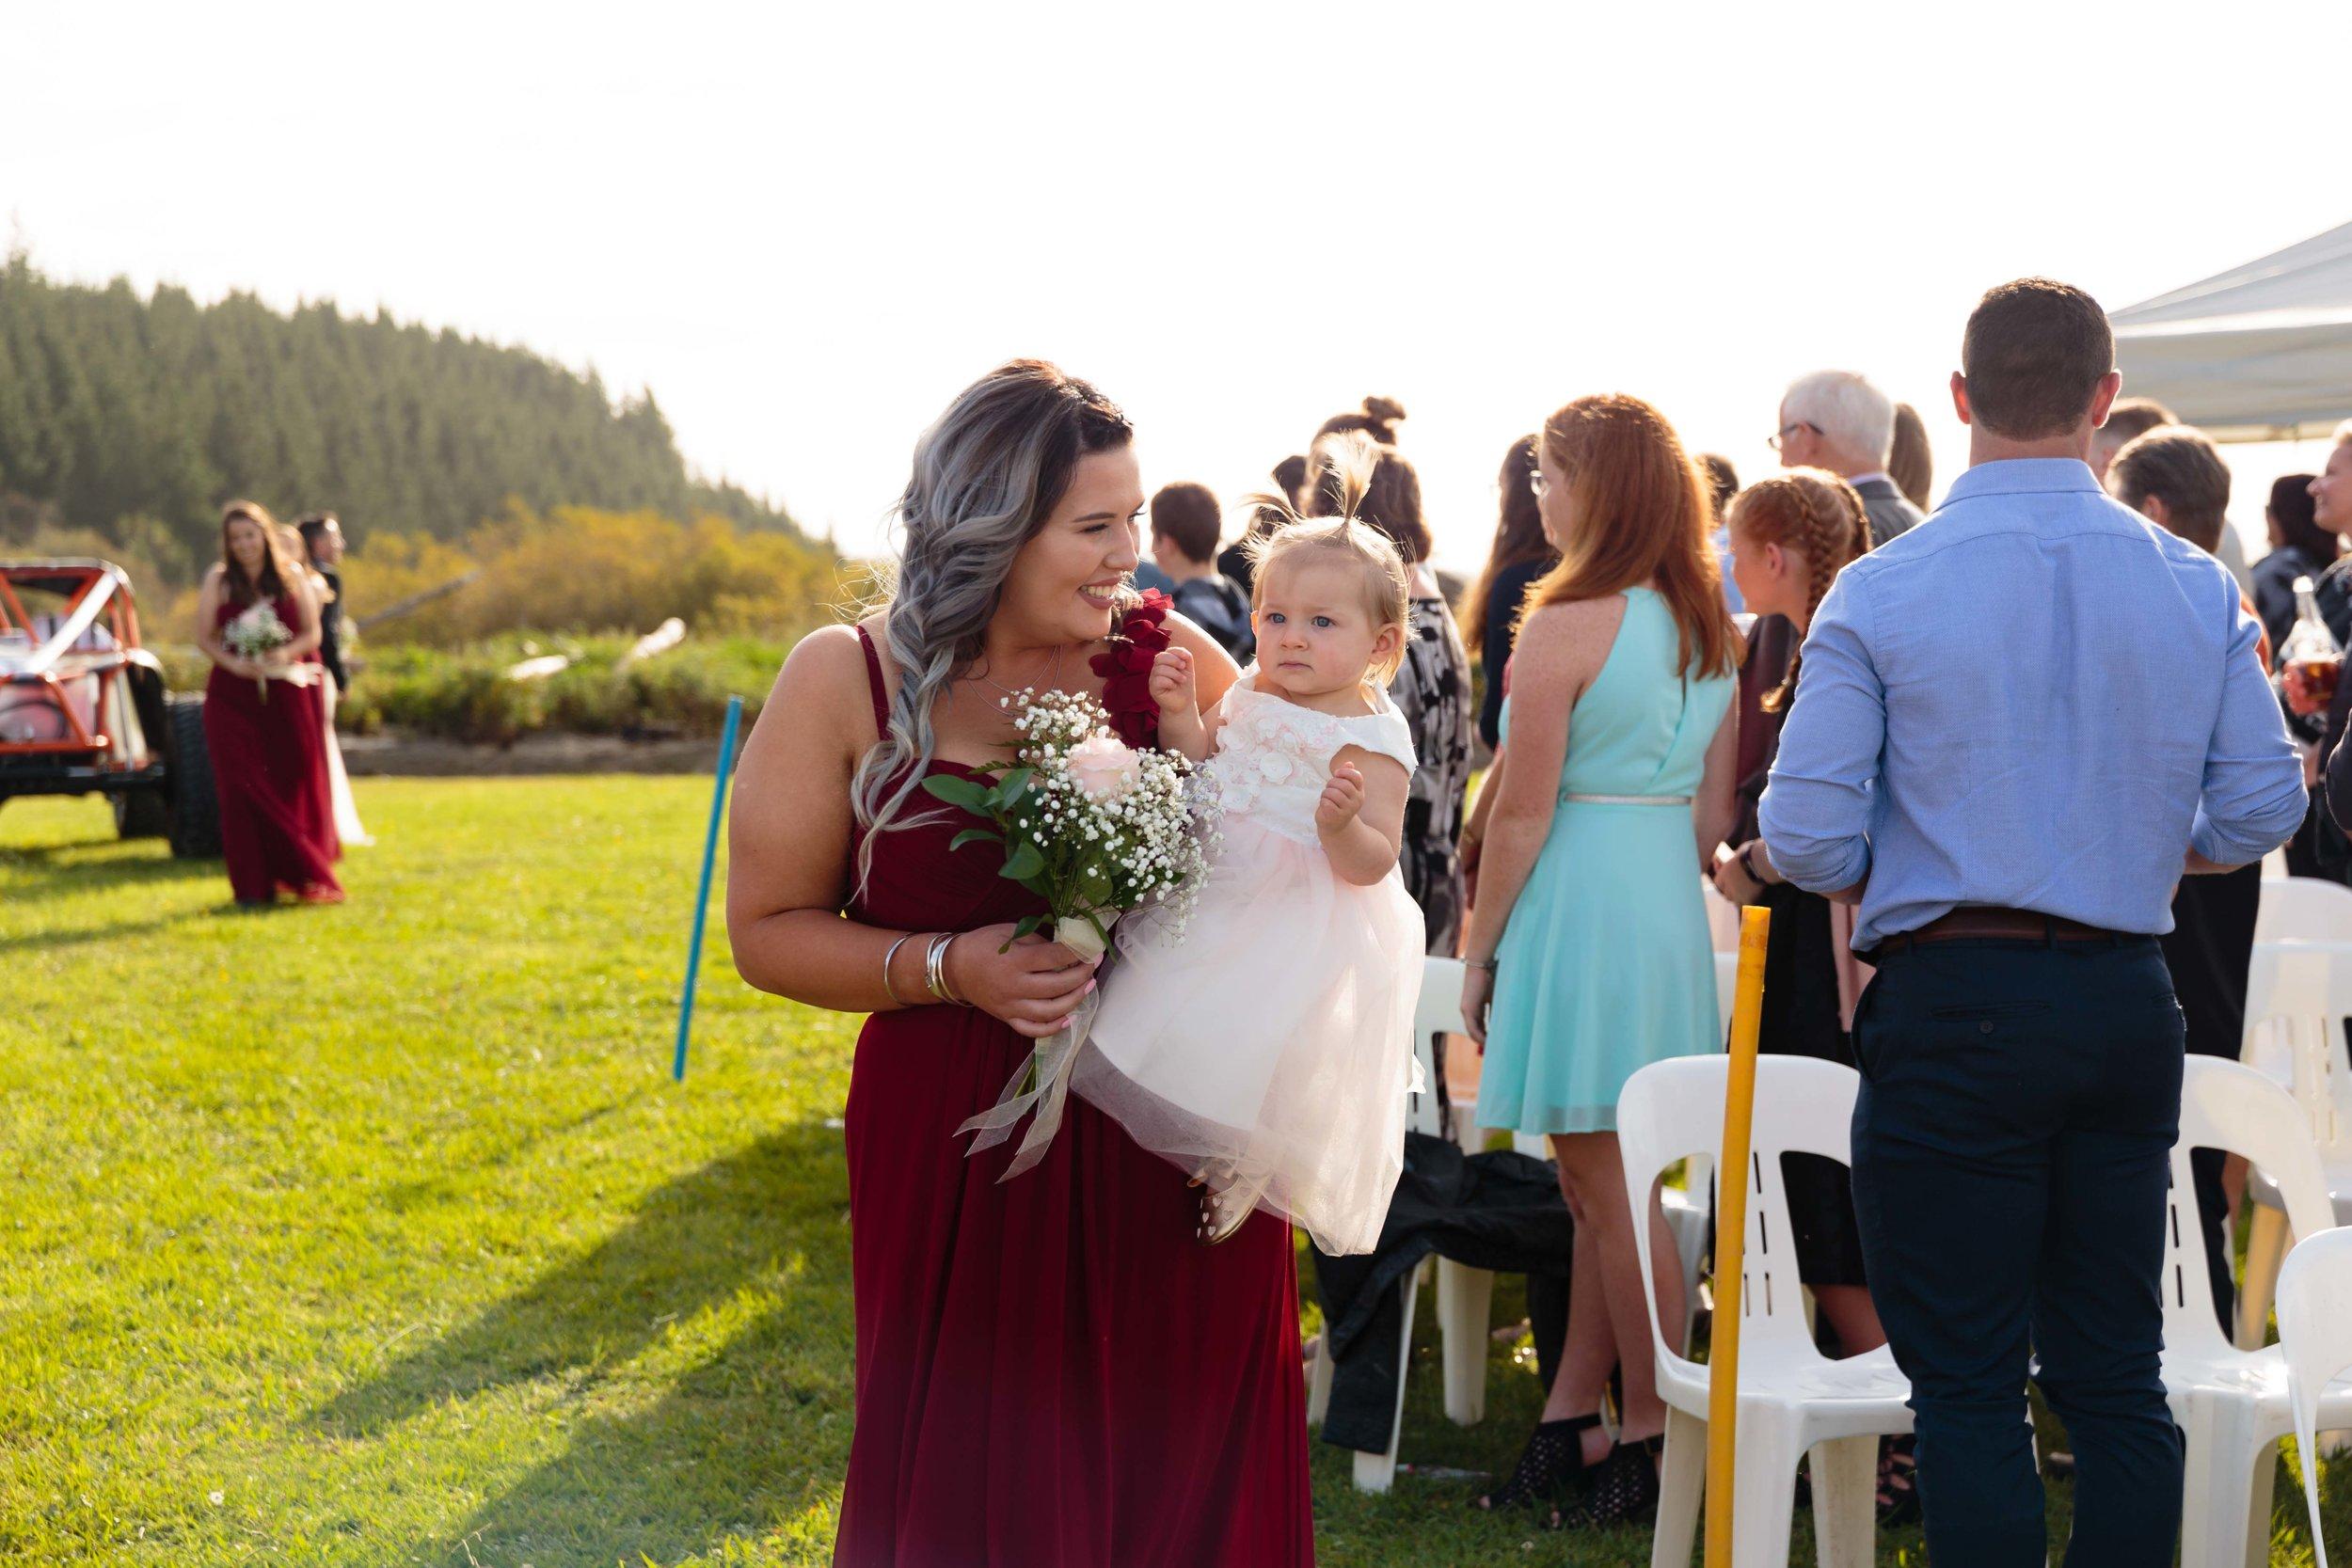 Highight-wedding-photography-dudding-lake-palmerston-north-new-zealand-30.jpg